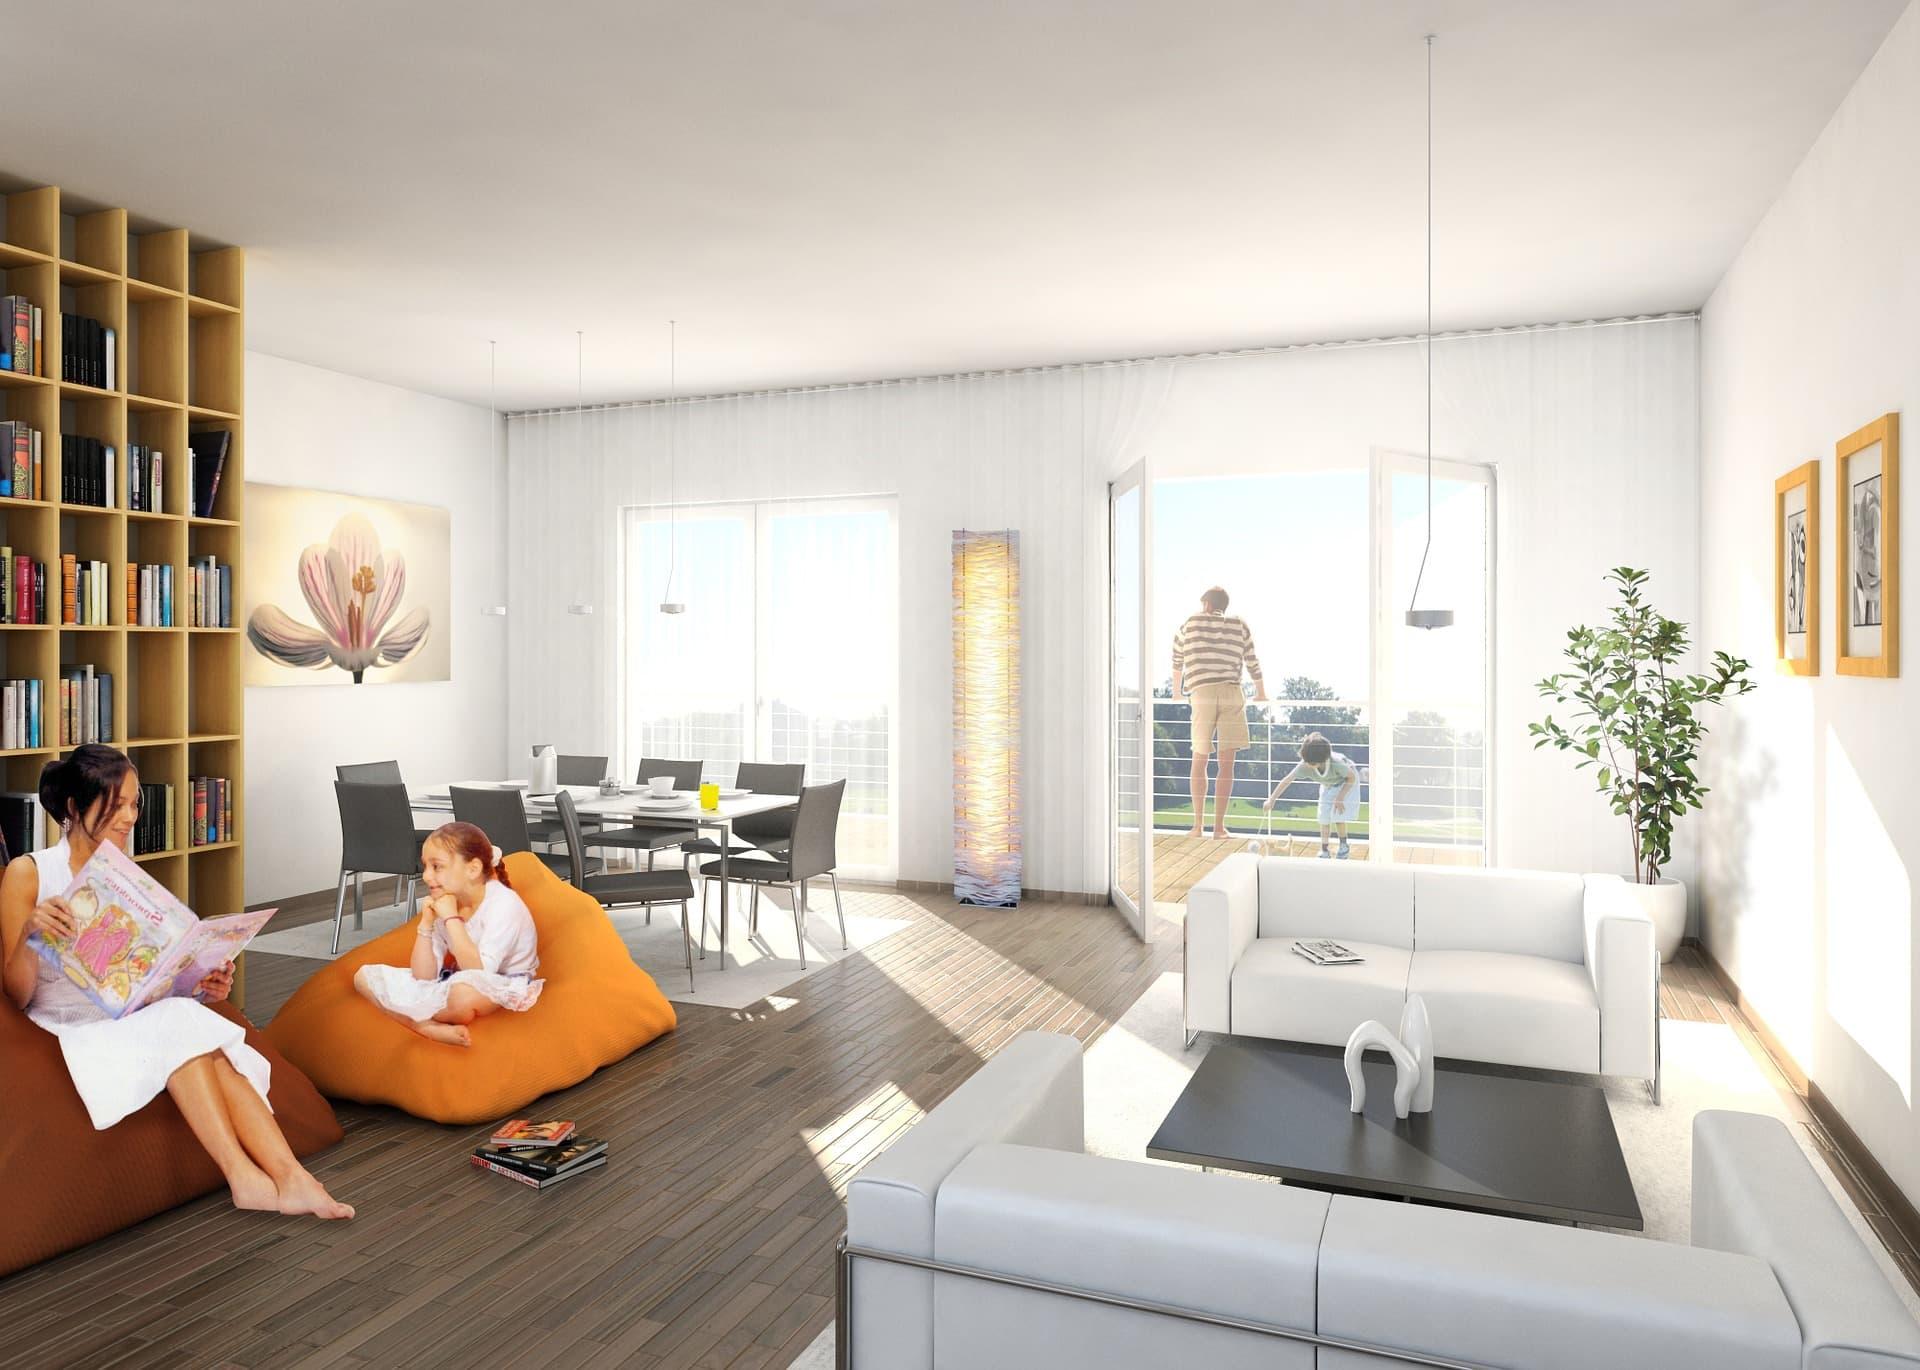 Smart Home compatible with Google Home, Amazon Alexa (Echo) and HomeKit